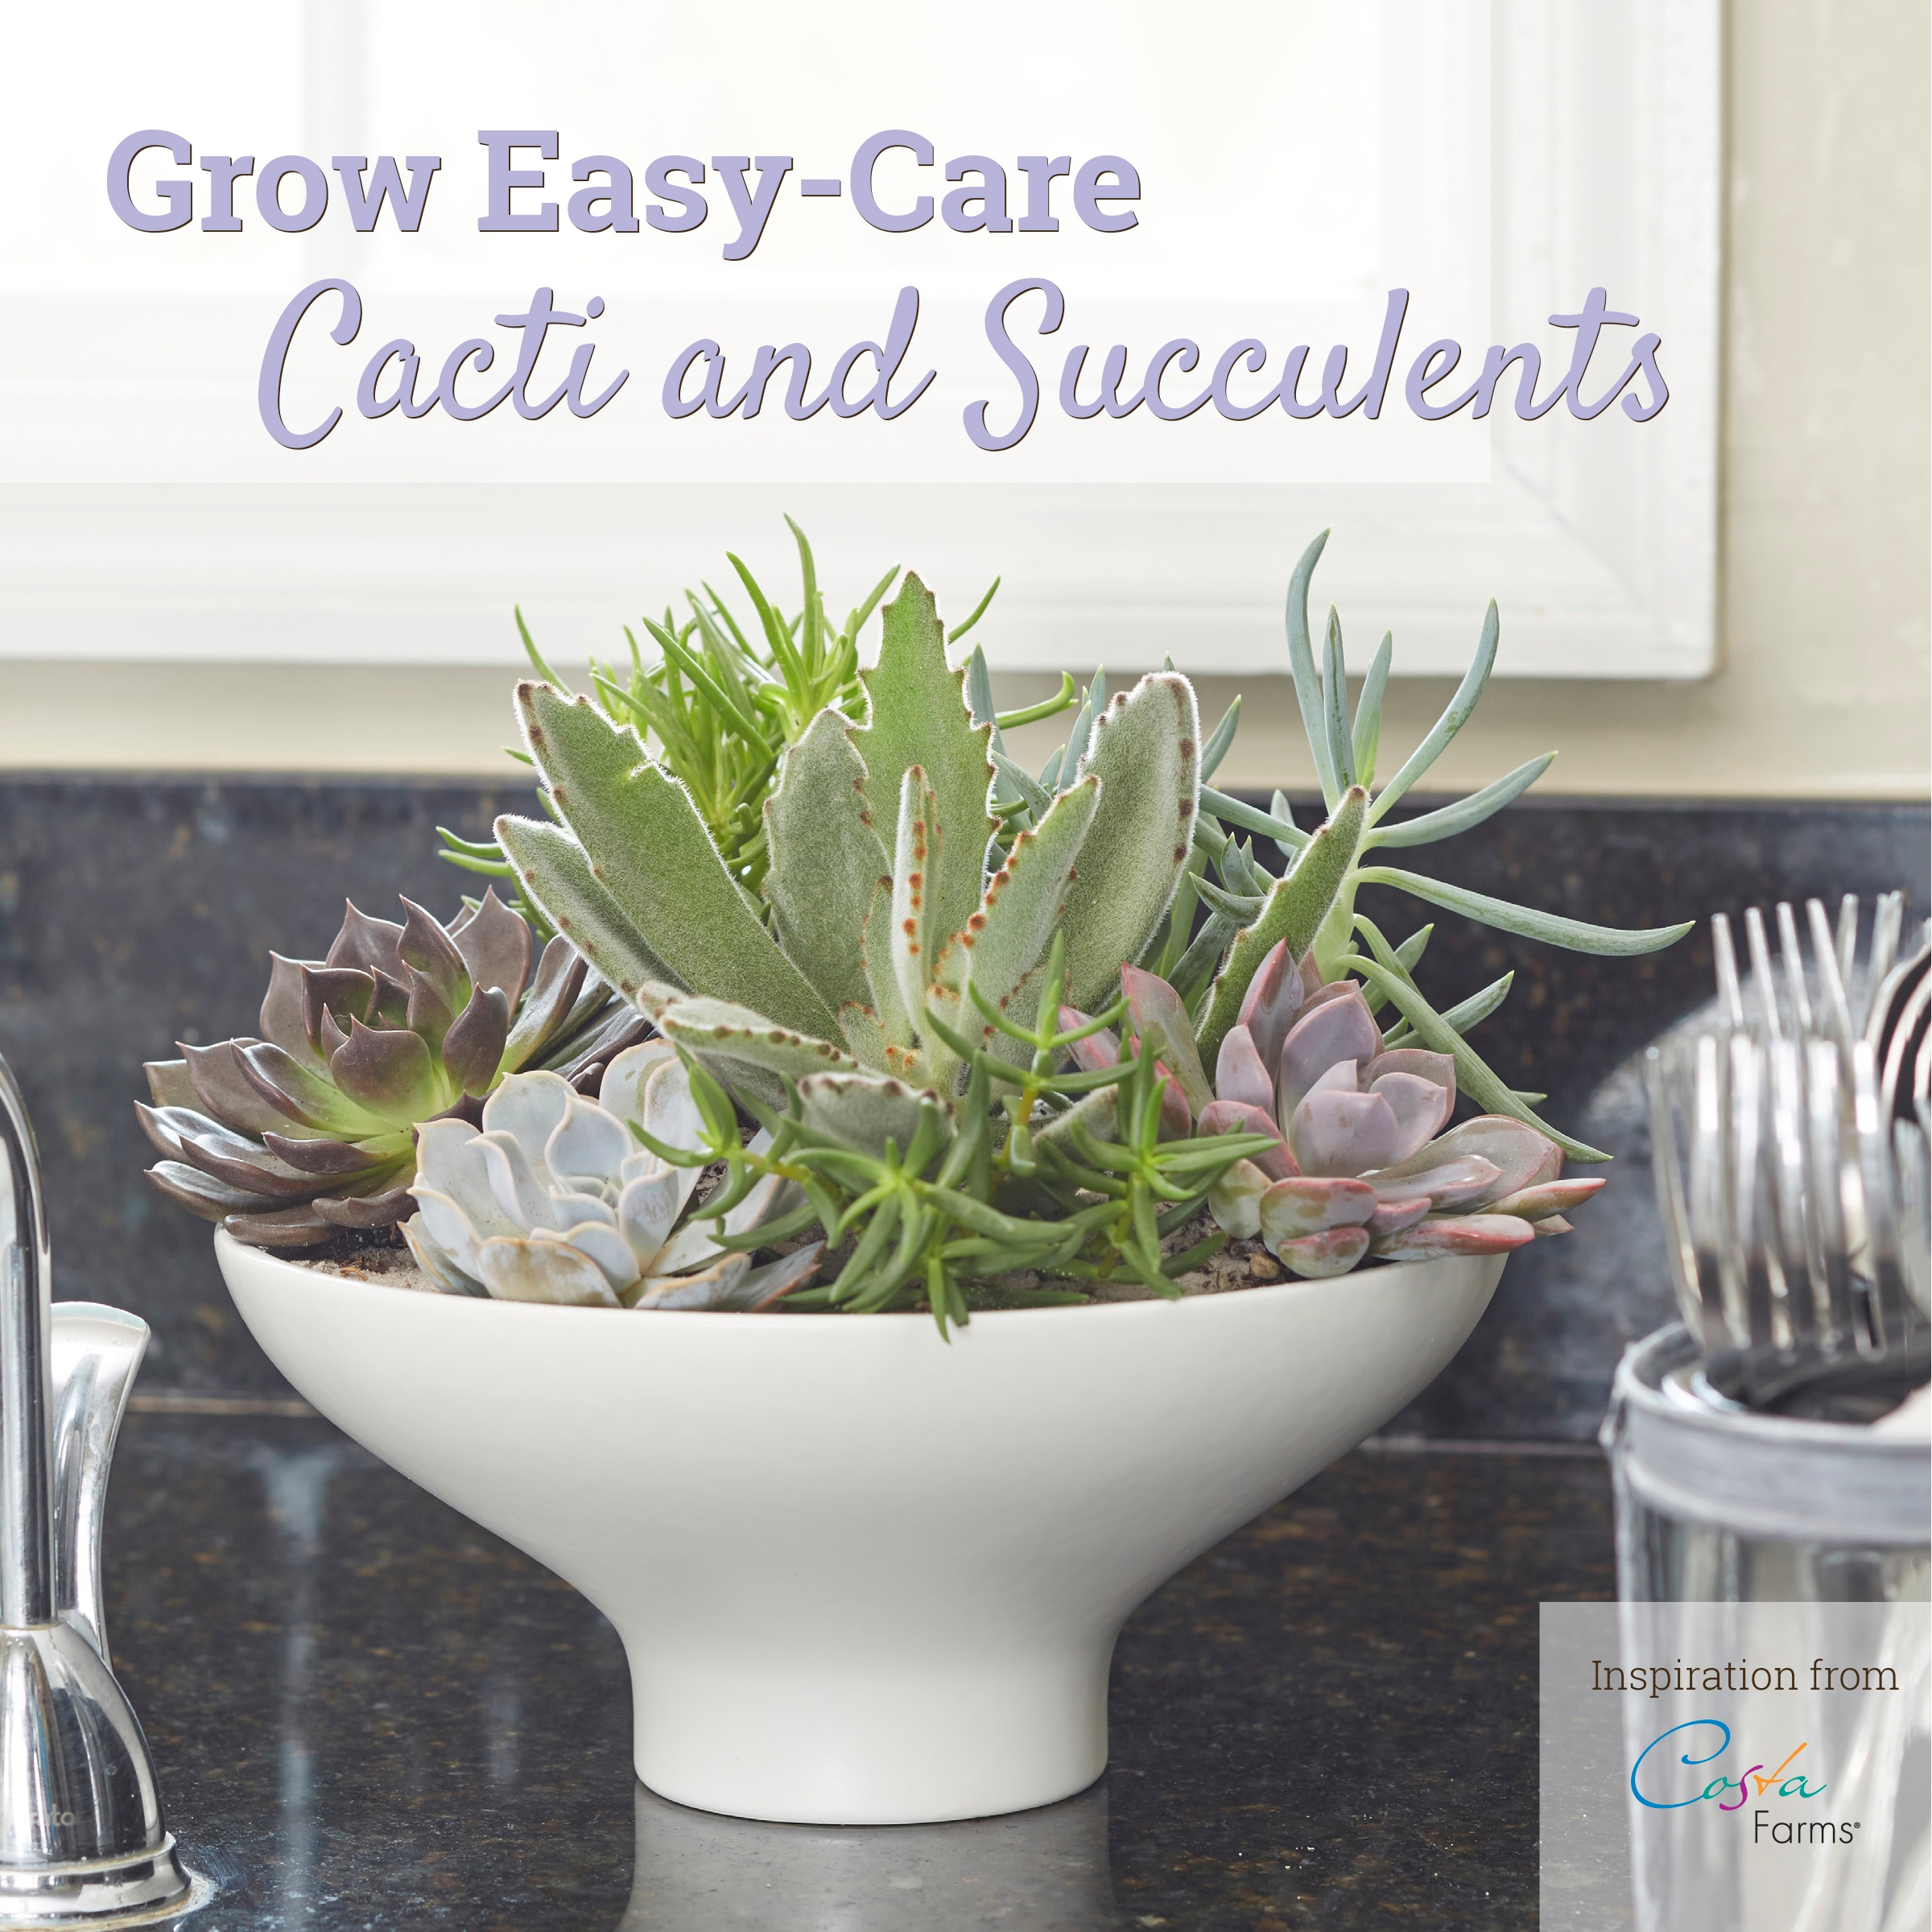 Cacti_and_Succulent_Idea_Book_Cover.jpg